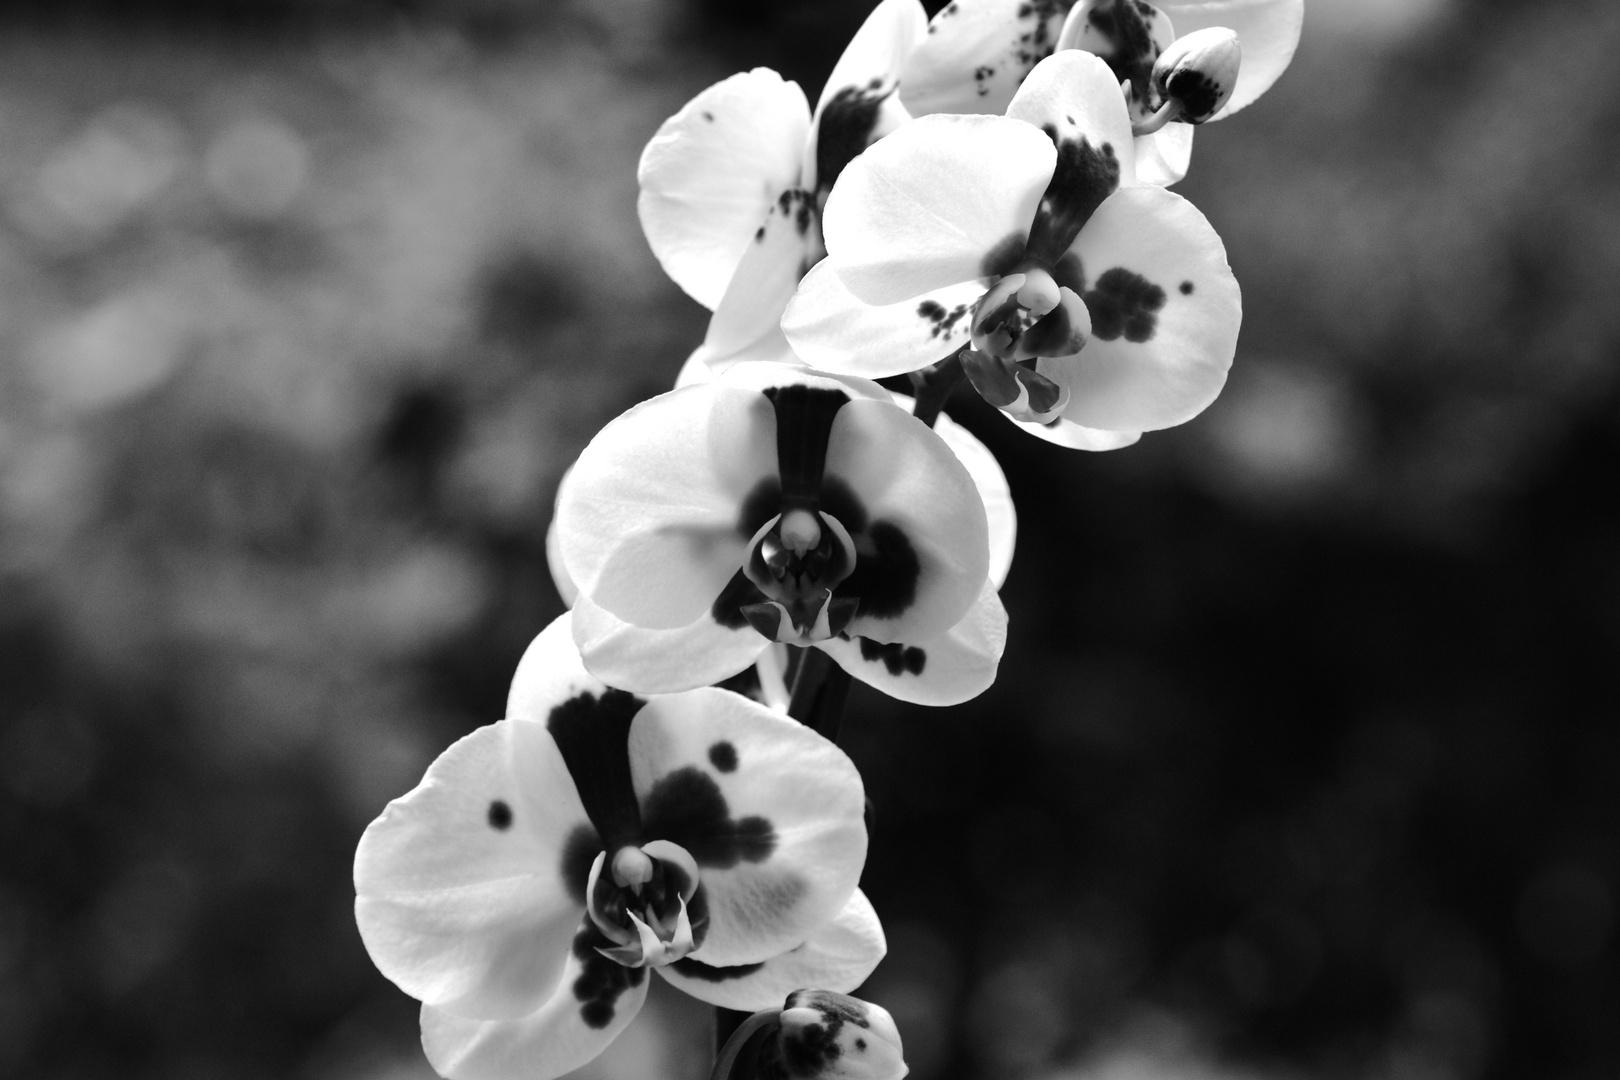 orchidee schwarz wei foto bild pflanzen pilze flechten bl ten kleinpflanzen. Black Bedroom Furniture Sets. Home Design Ideas